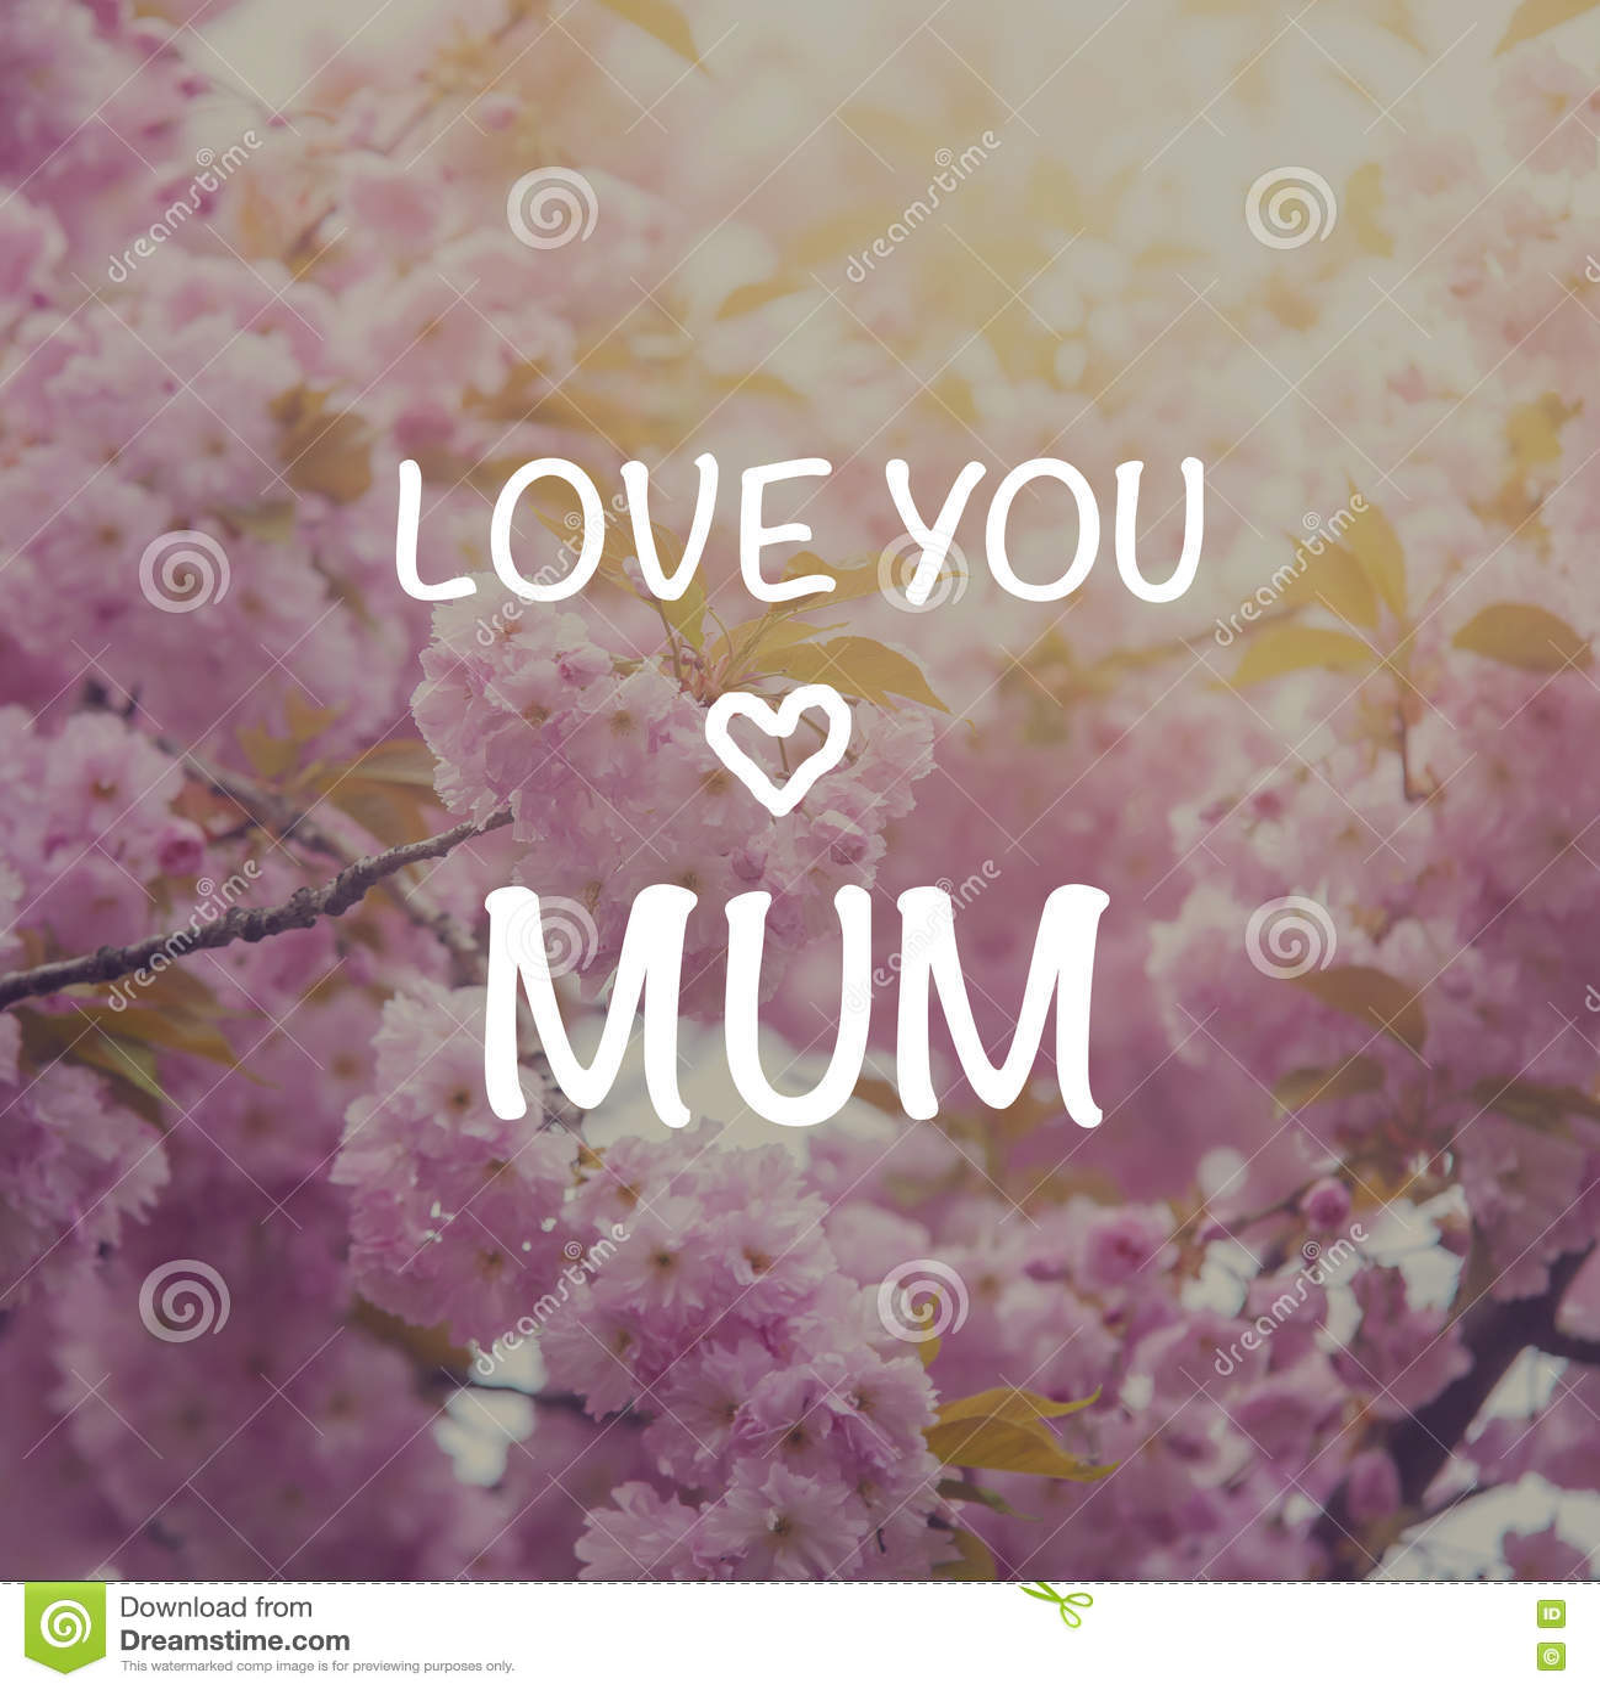 I love you mum card stock image. Image of sakura, dream ...